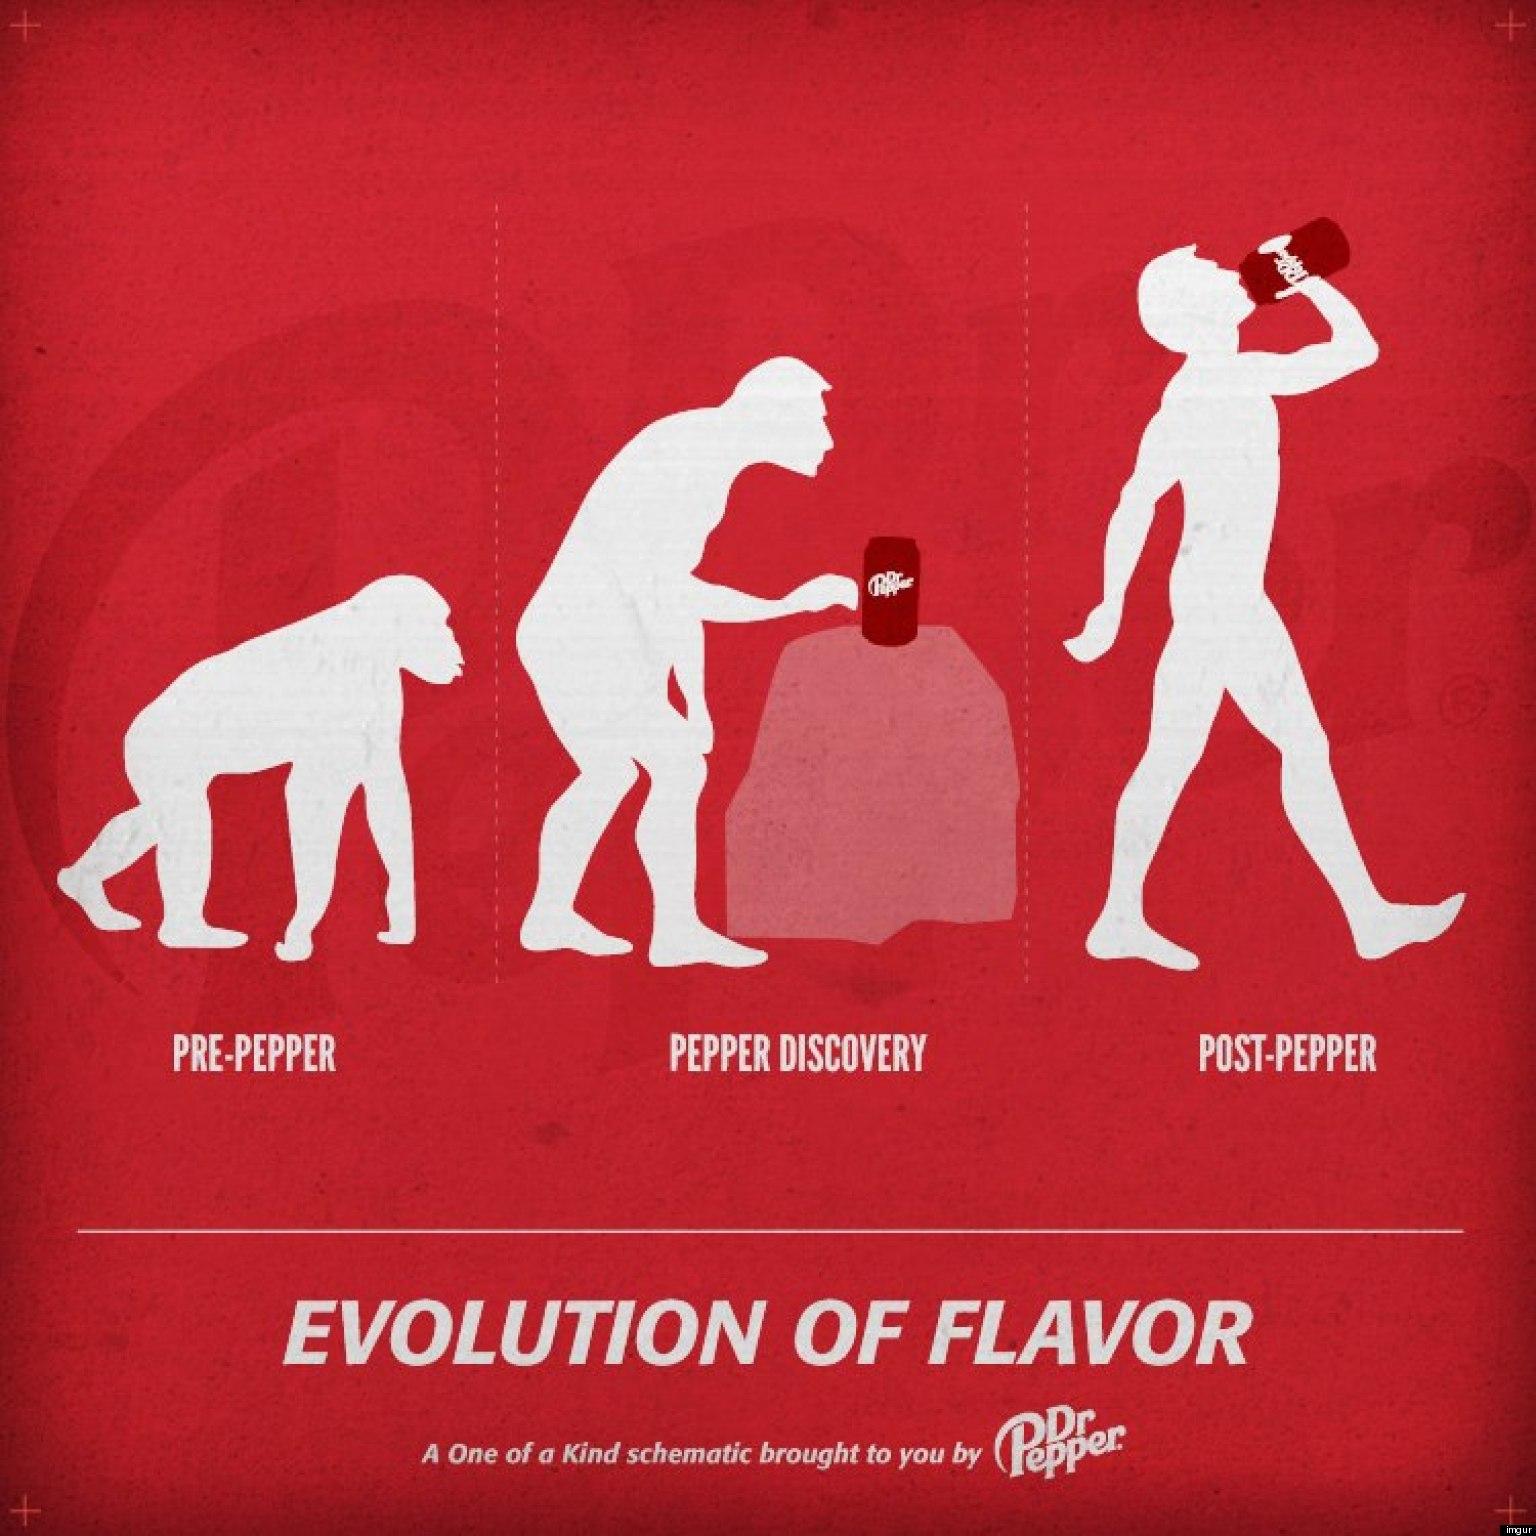 Dr Pepper 'evolution Of Flavor' Ad Sparks Backlash From Christians On  Facebook (photos